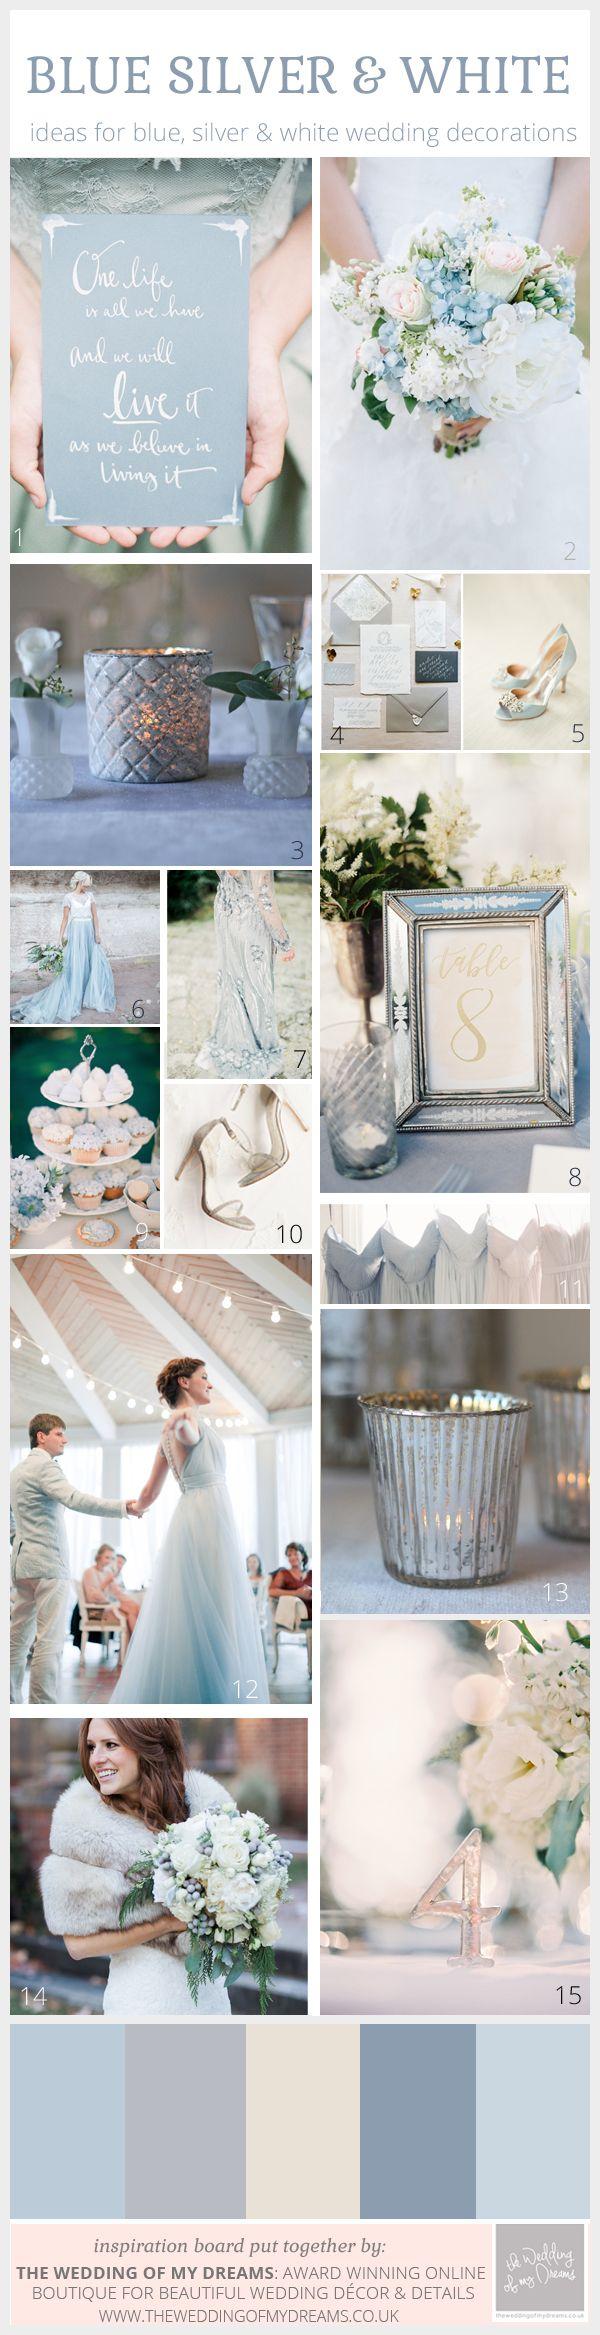 Enchanting Winter Wedding Colour Scheme: White, Blue and Silver ...